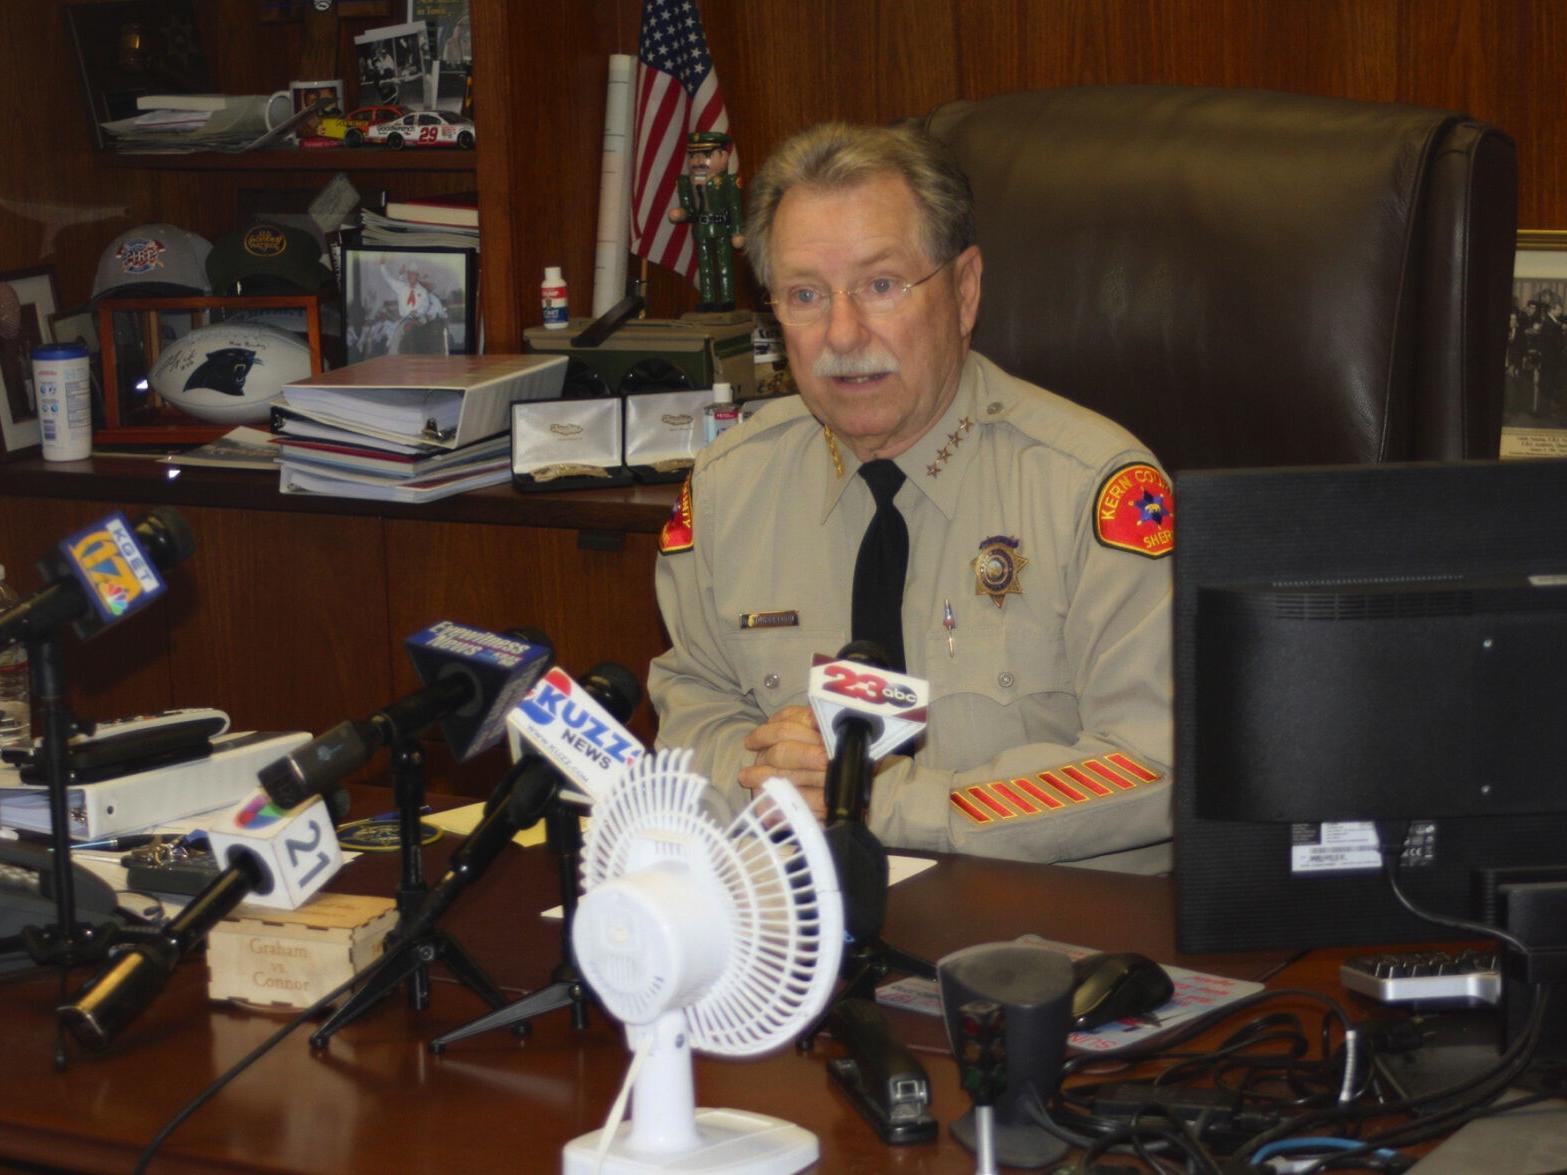 Chp Officer Cdcr Employee Among 15 Arrested In Kcso Online Child Predator Operation Breaking Bakersfield Com